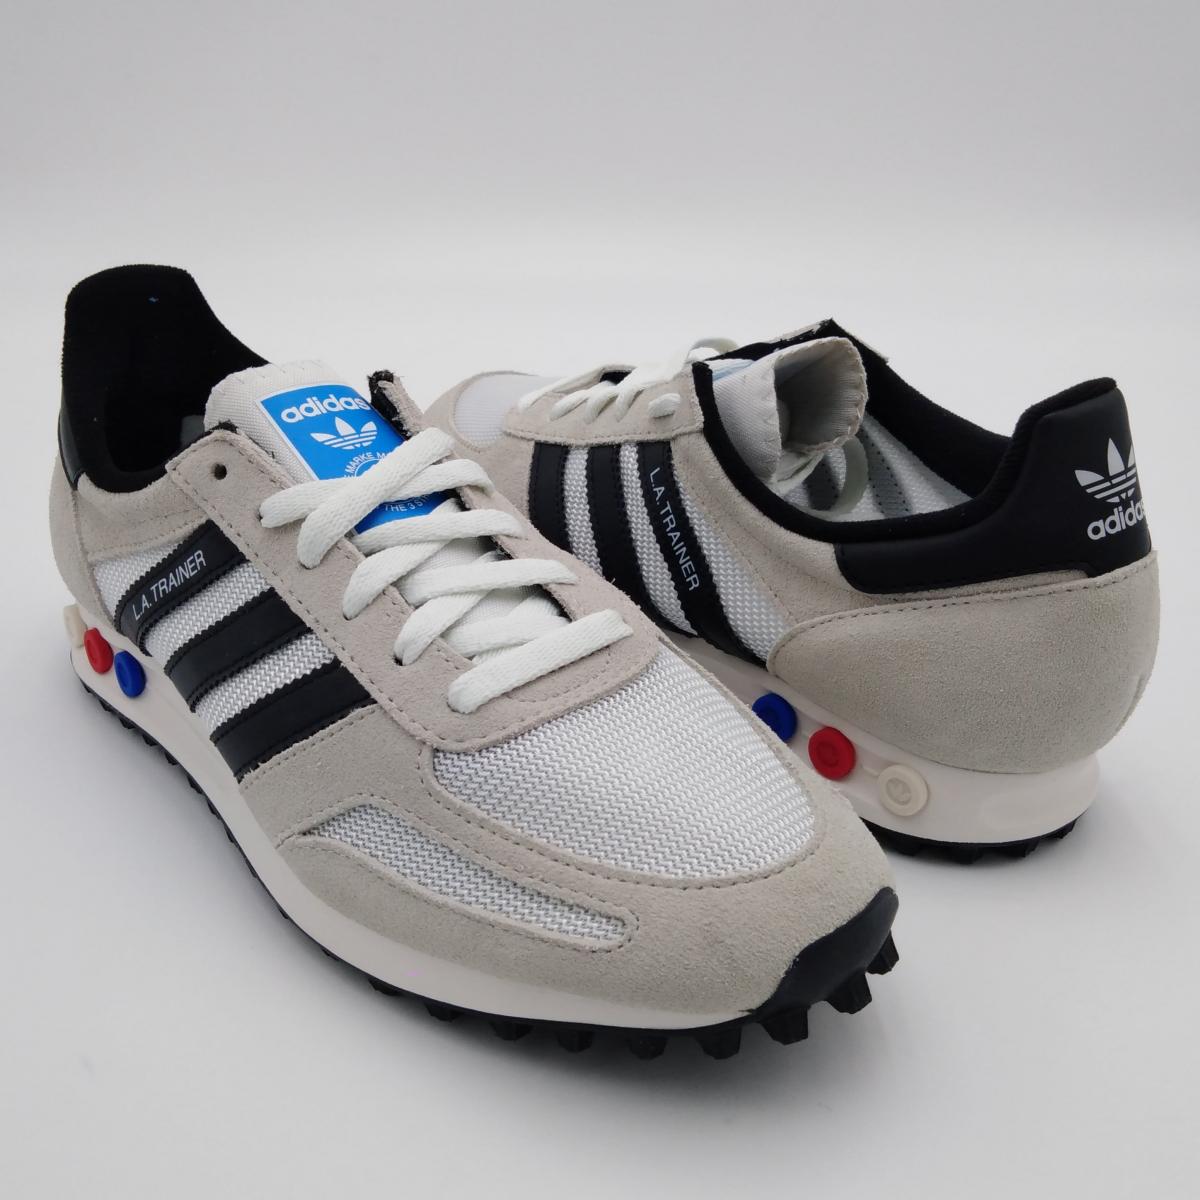 Adidas LA Trainer -Sneaker...